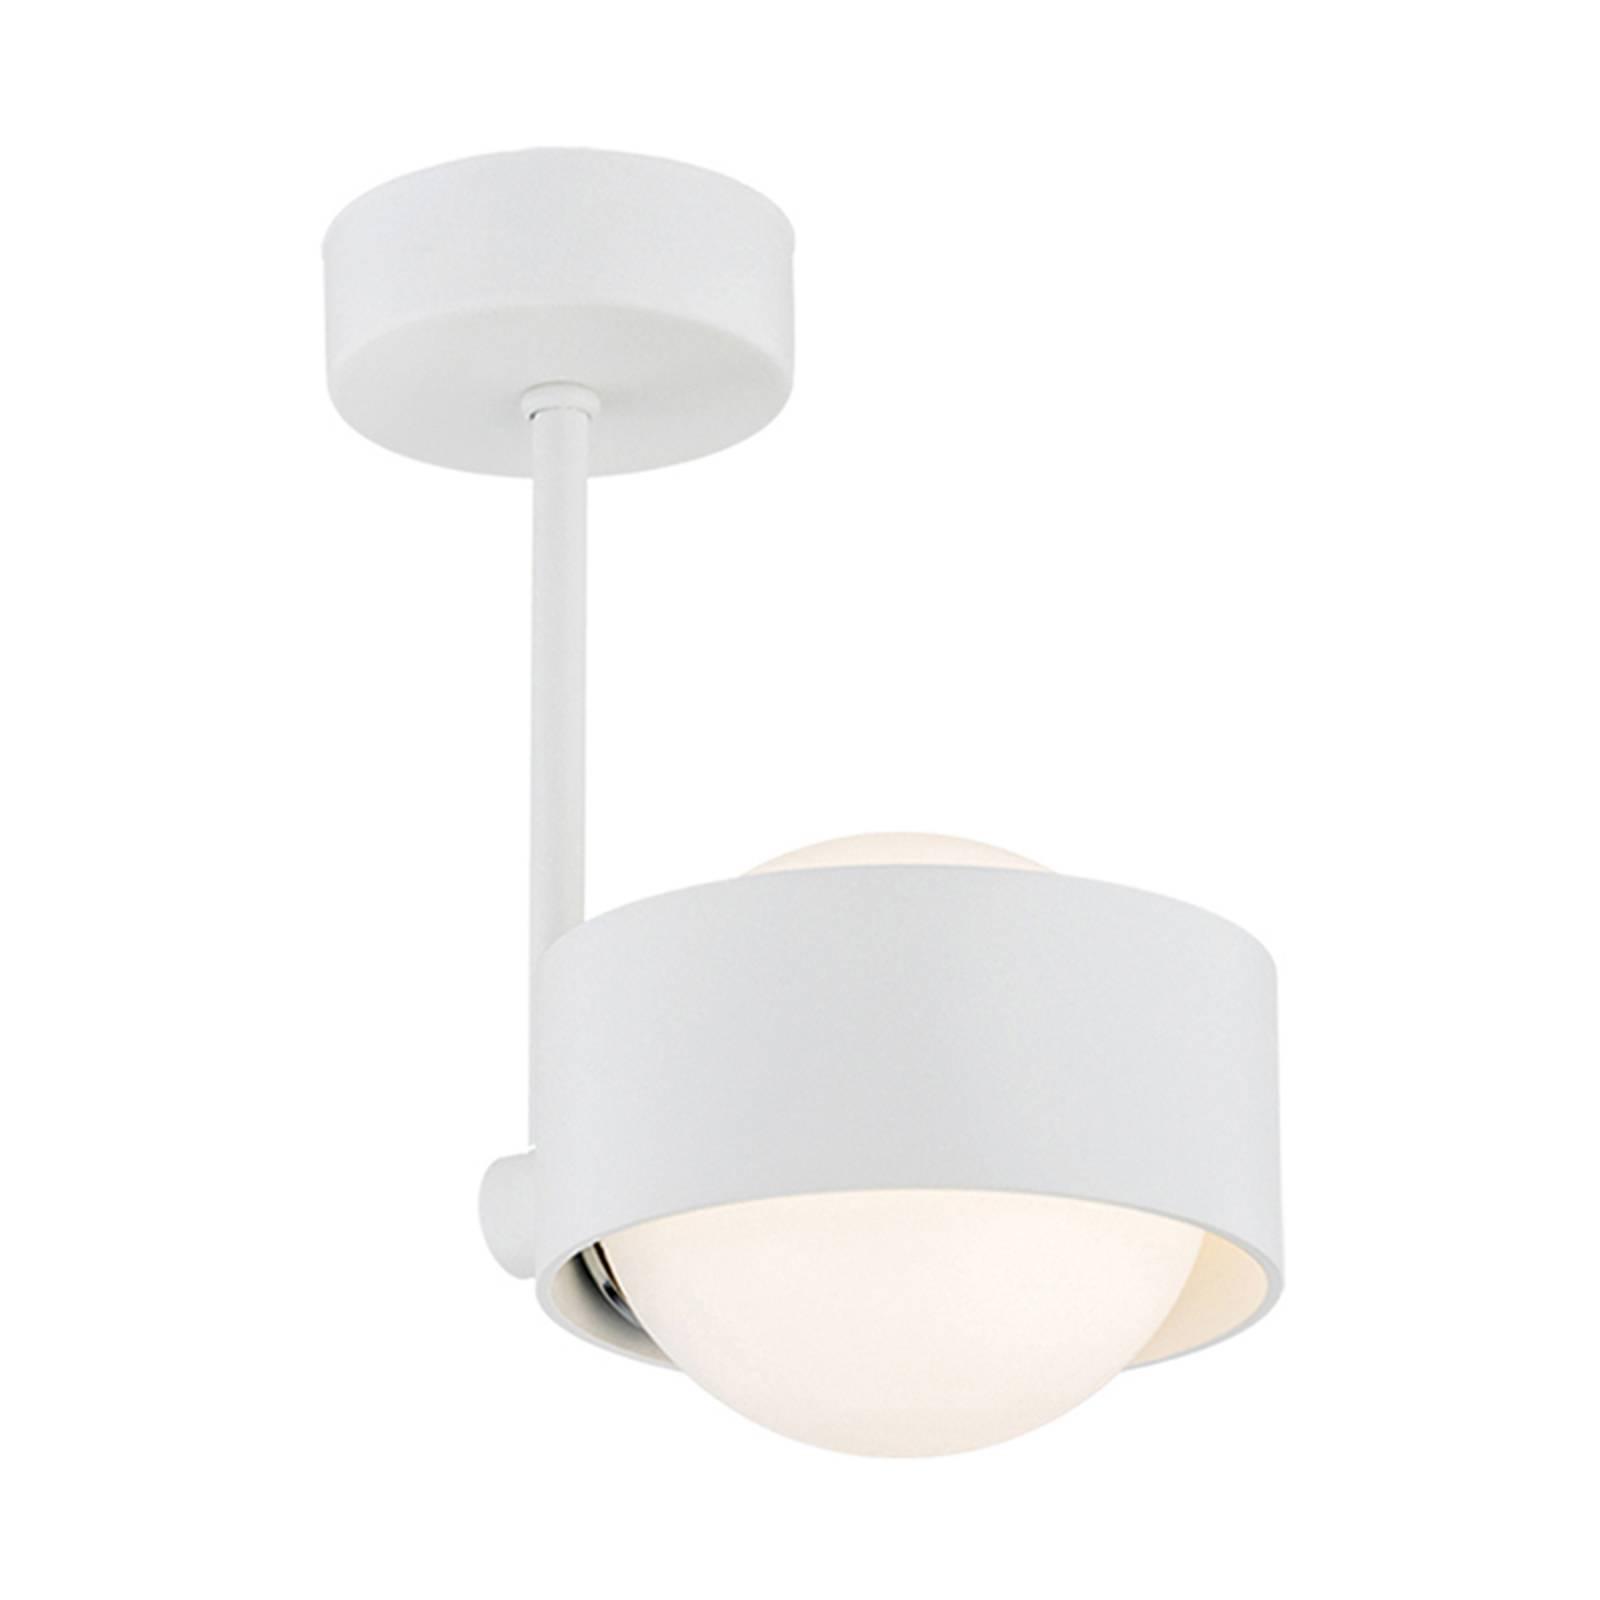 Plafoniera LED da bagno Macedo, 1 luce, bianco